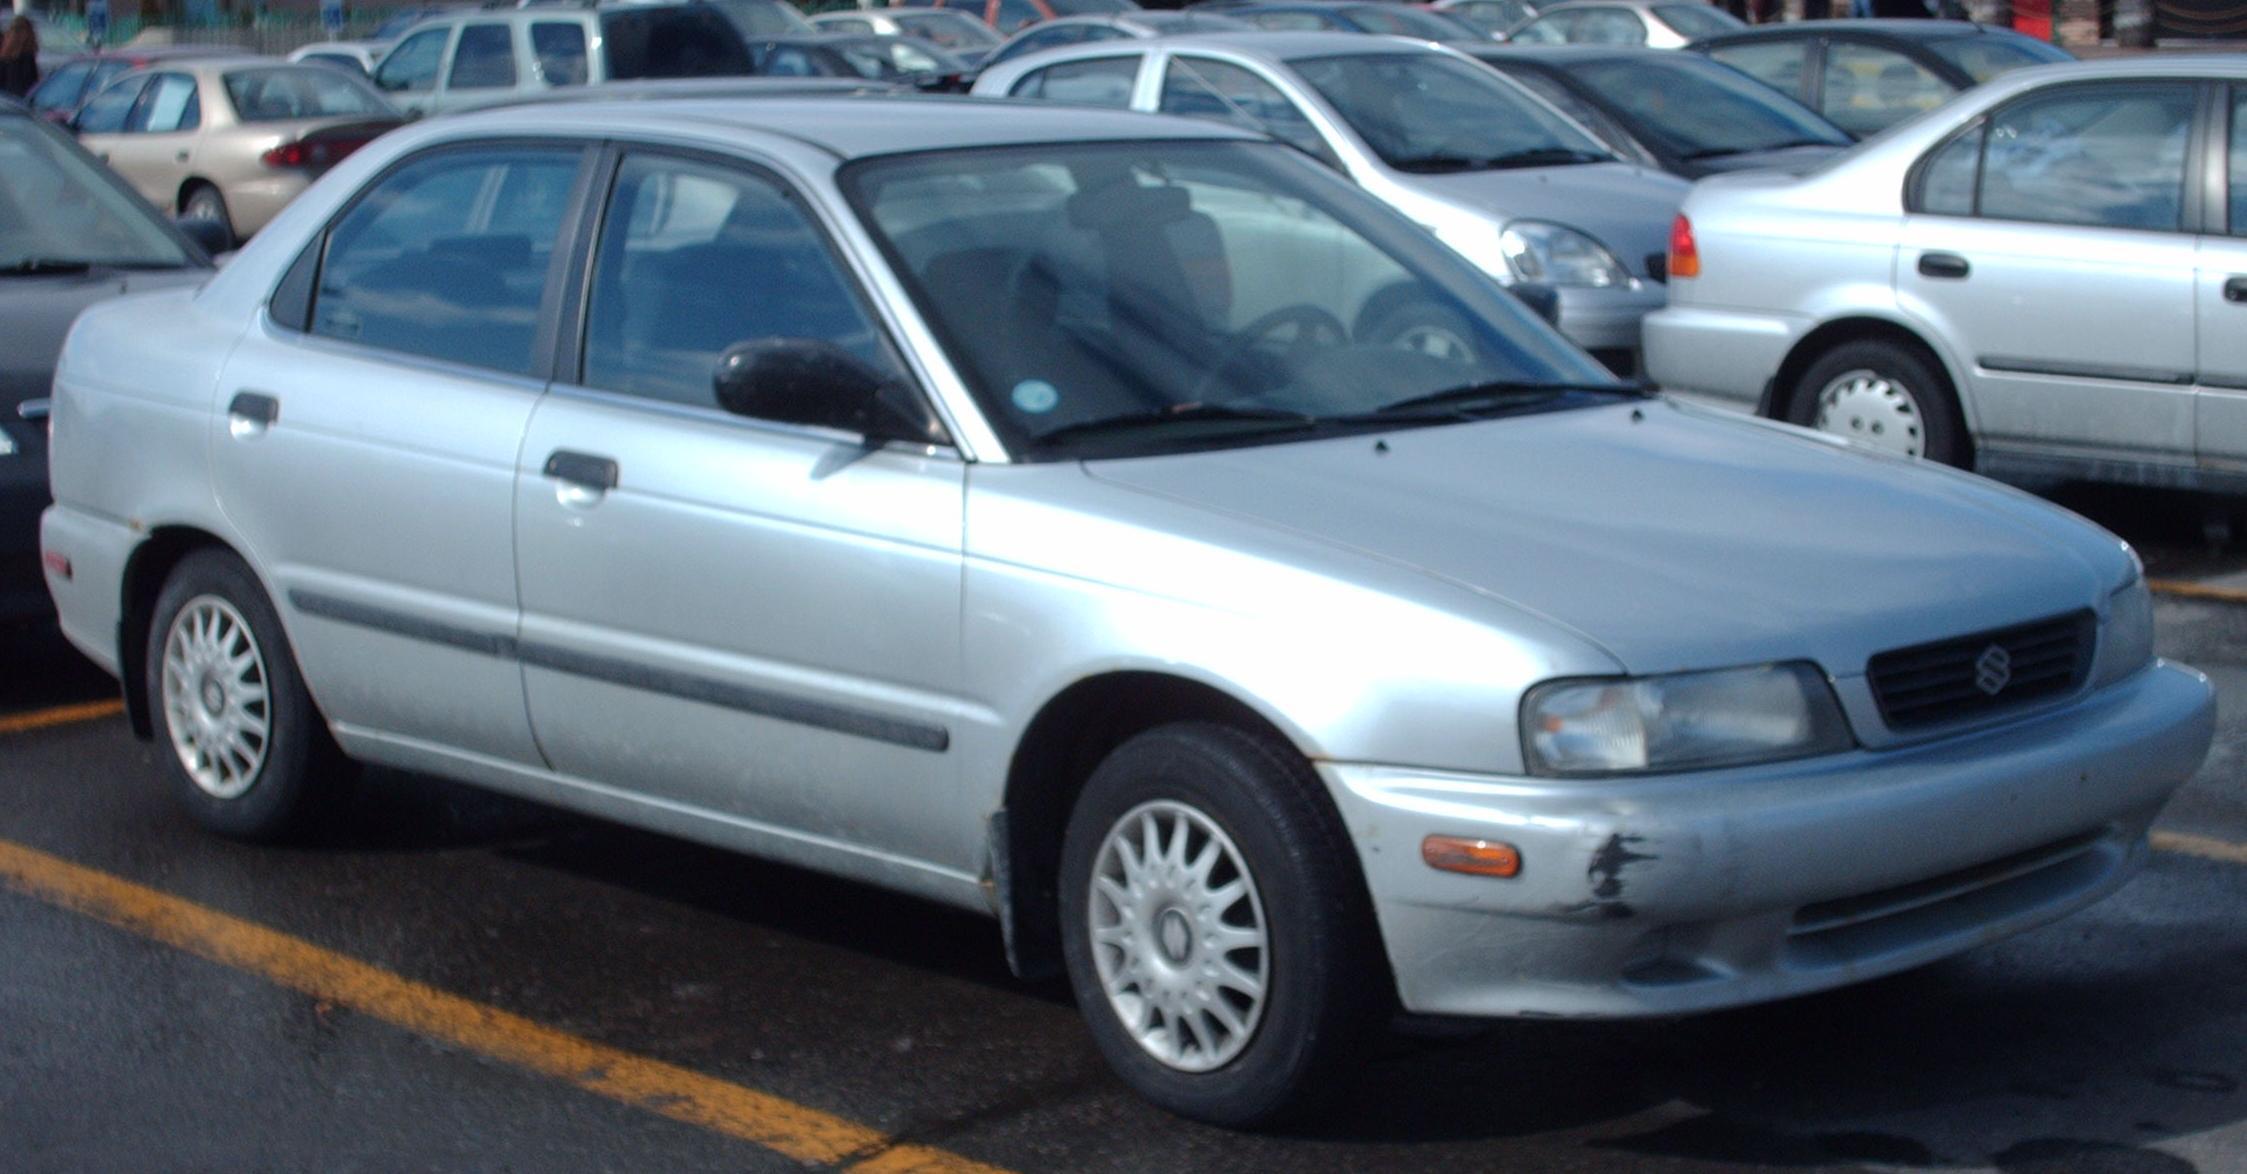 1996 Suzuki Esteem - Information and photos - ZombieDrive